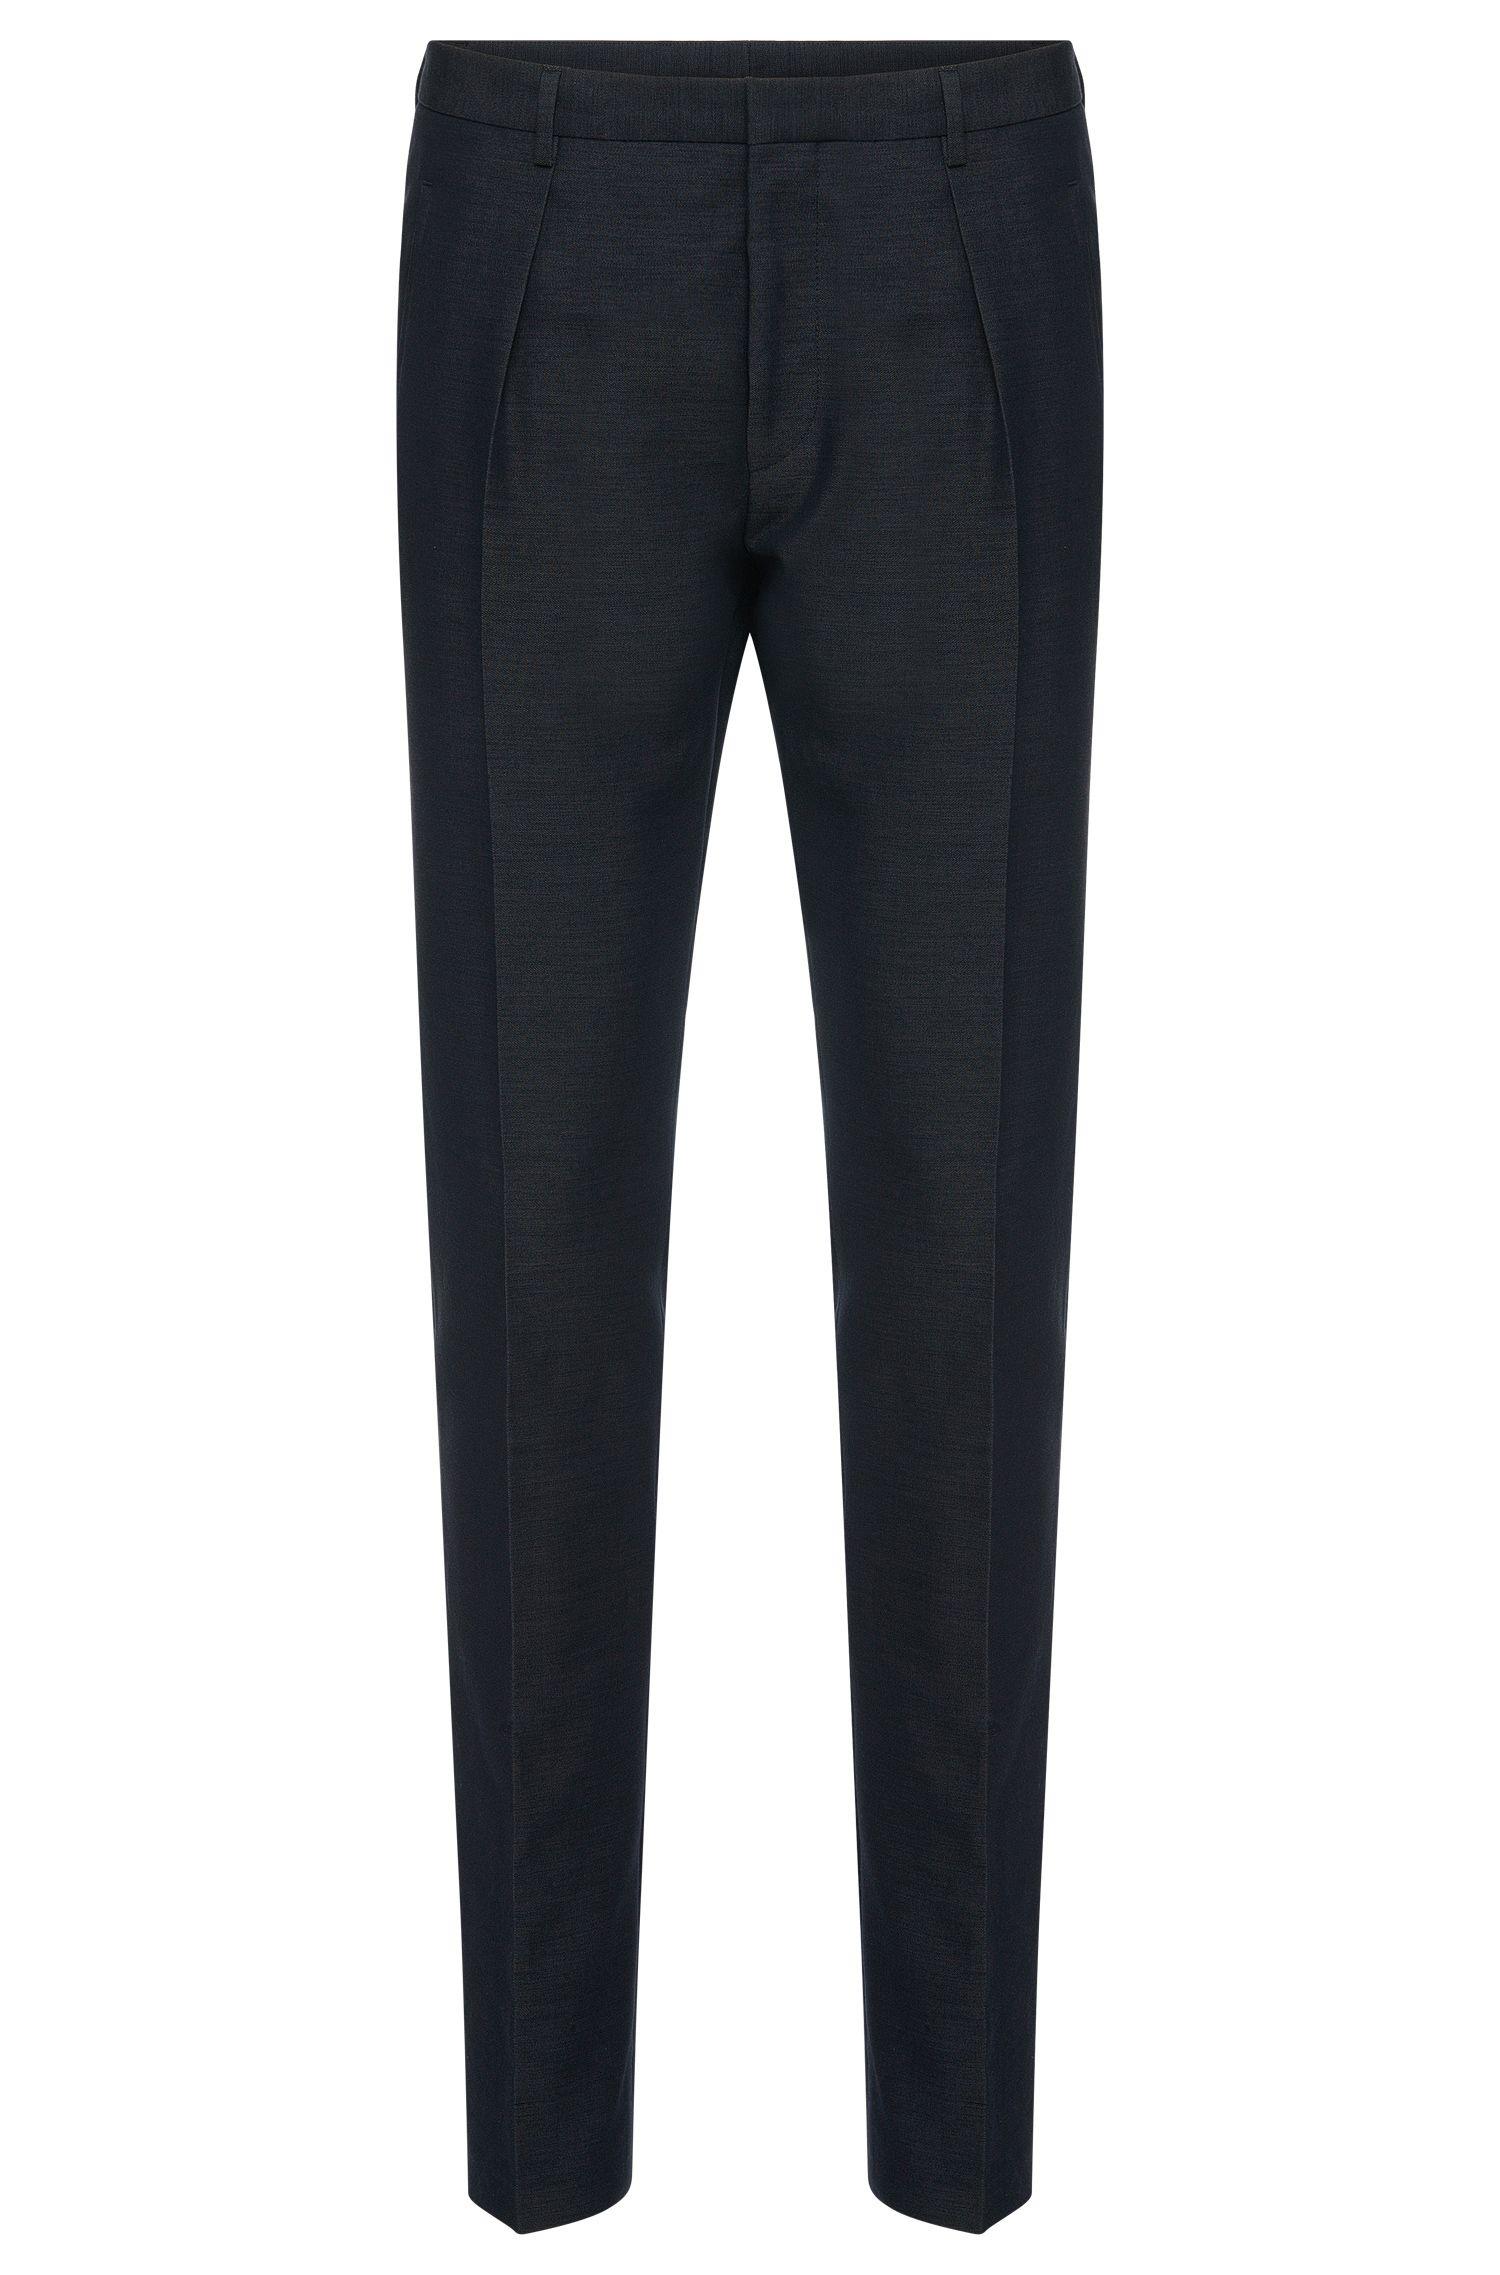 'Per'   Slim Fit, Cotton Silk Dress Pants